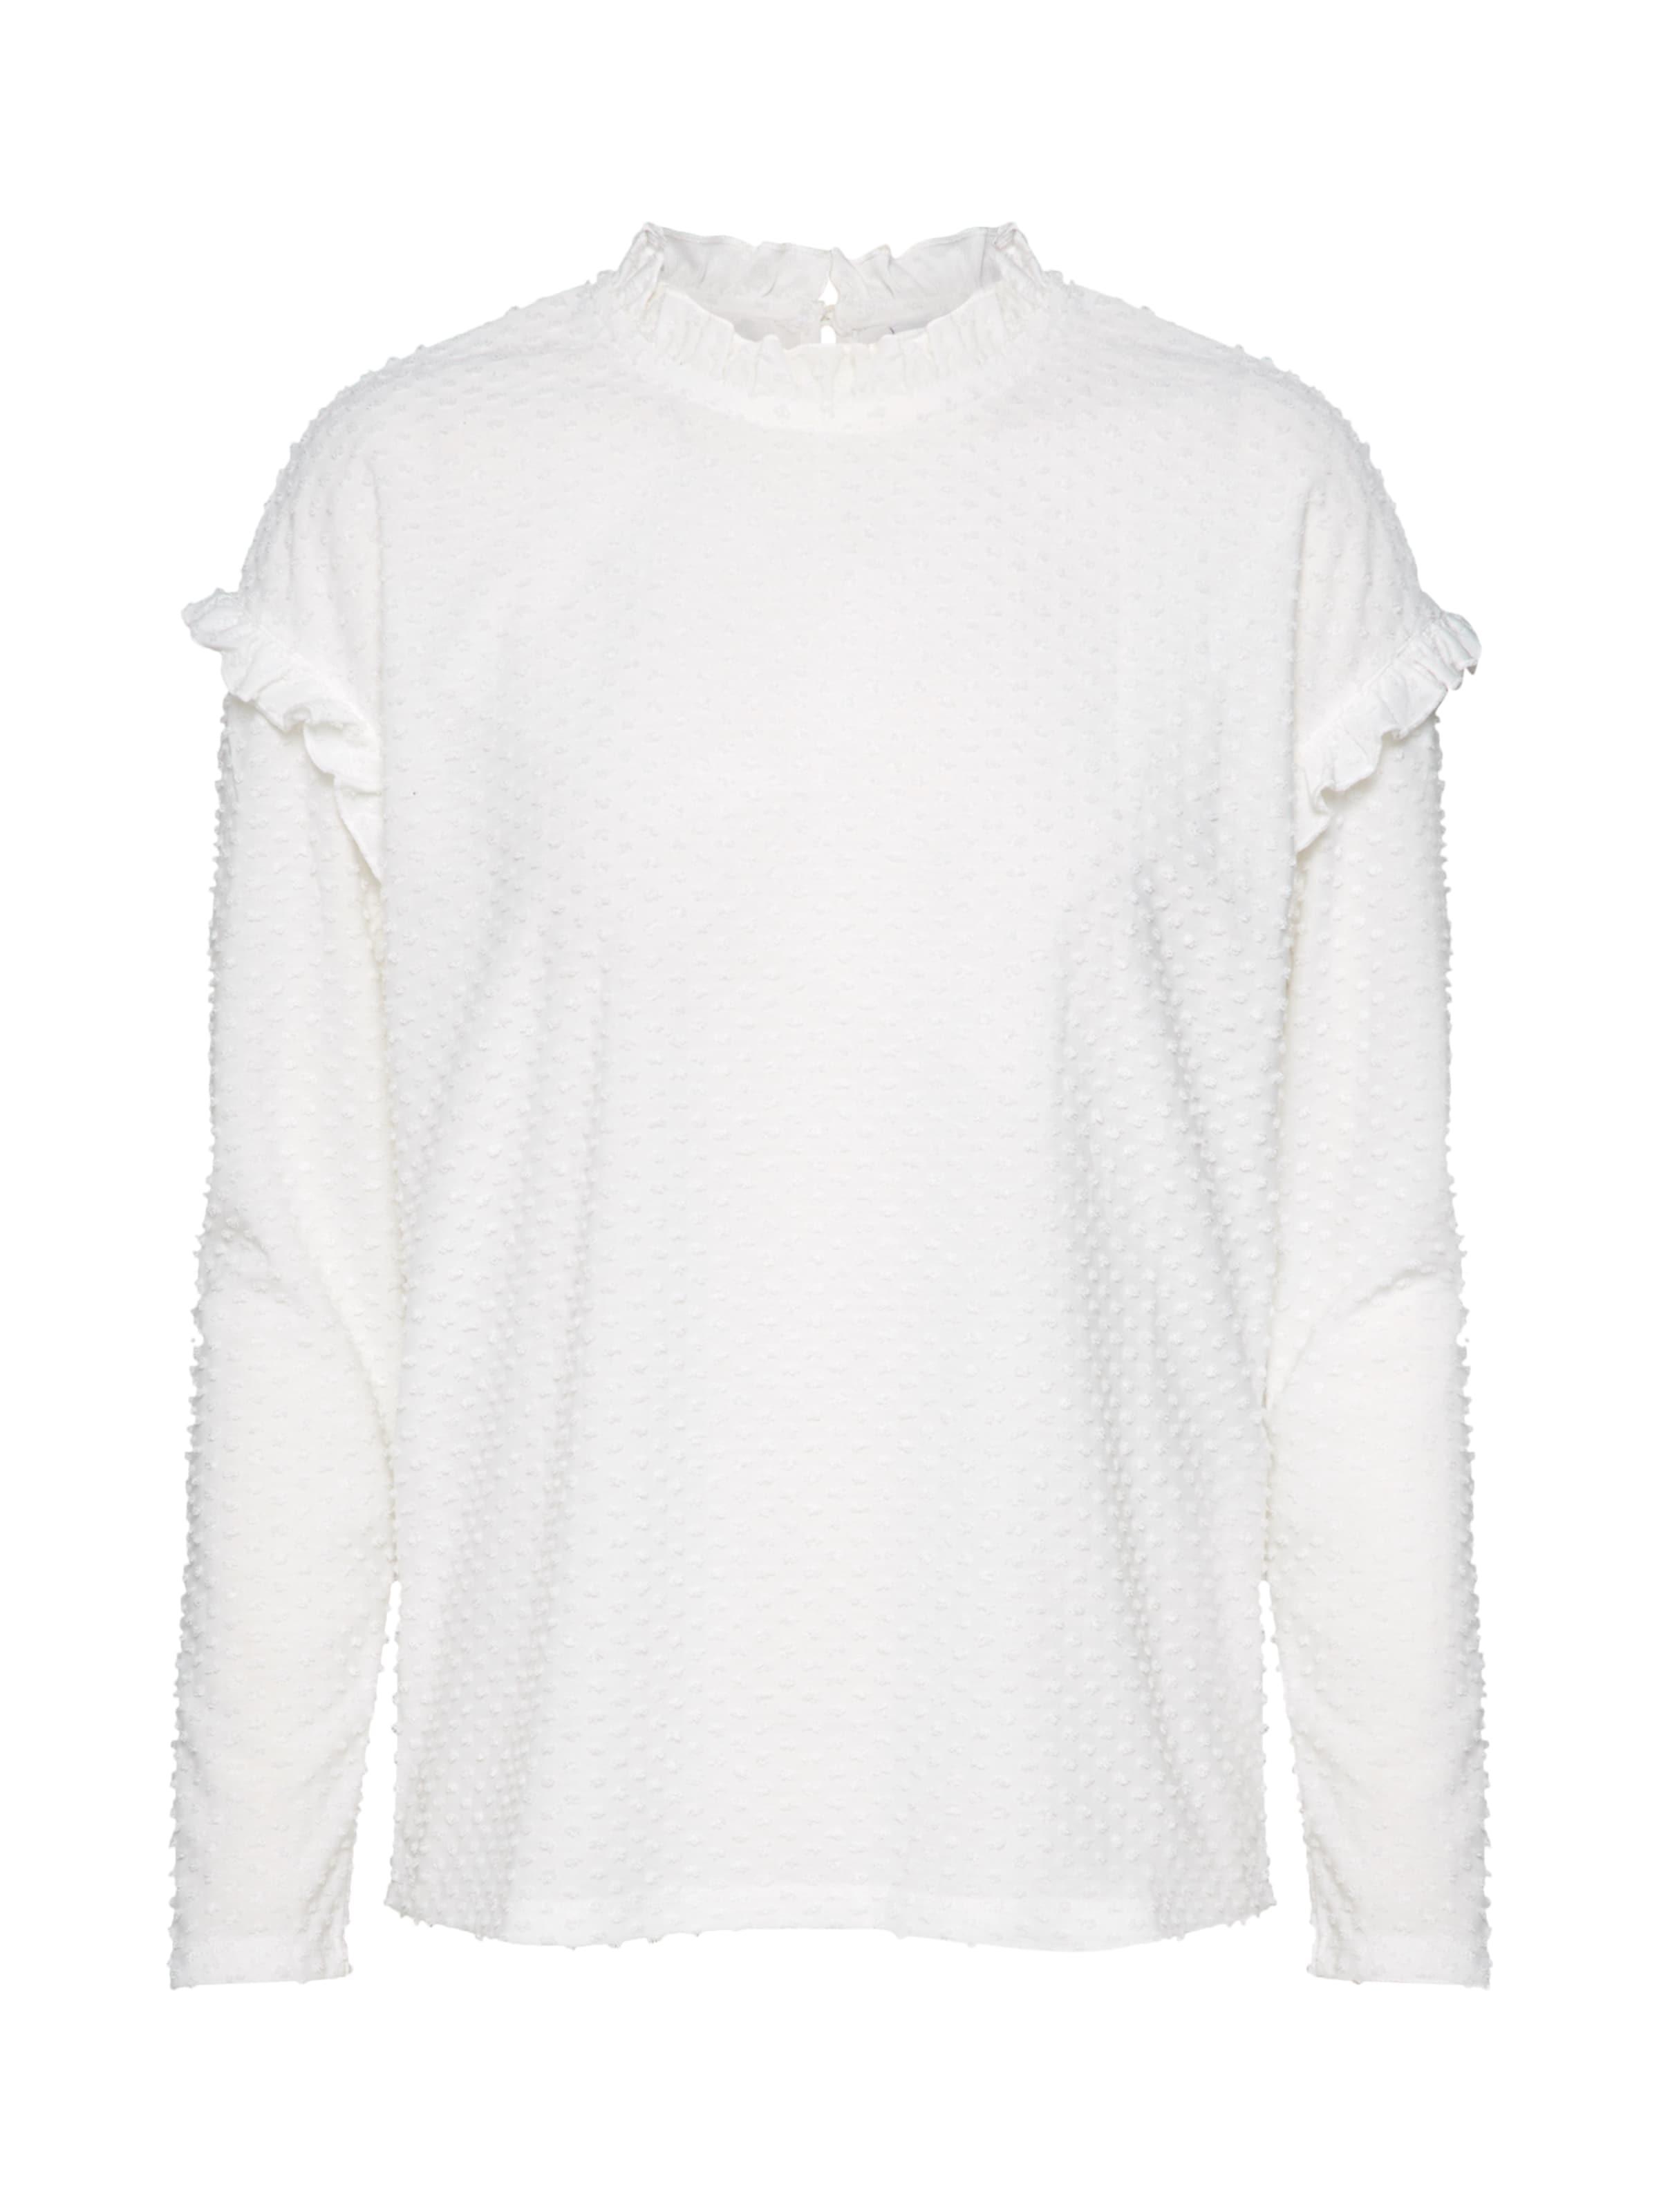 'rositta' De Blanc En Chemisier Yong Jacqueline n8wk0PO